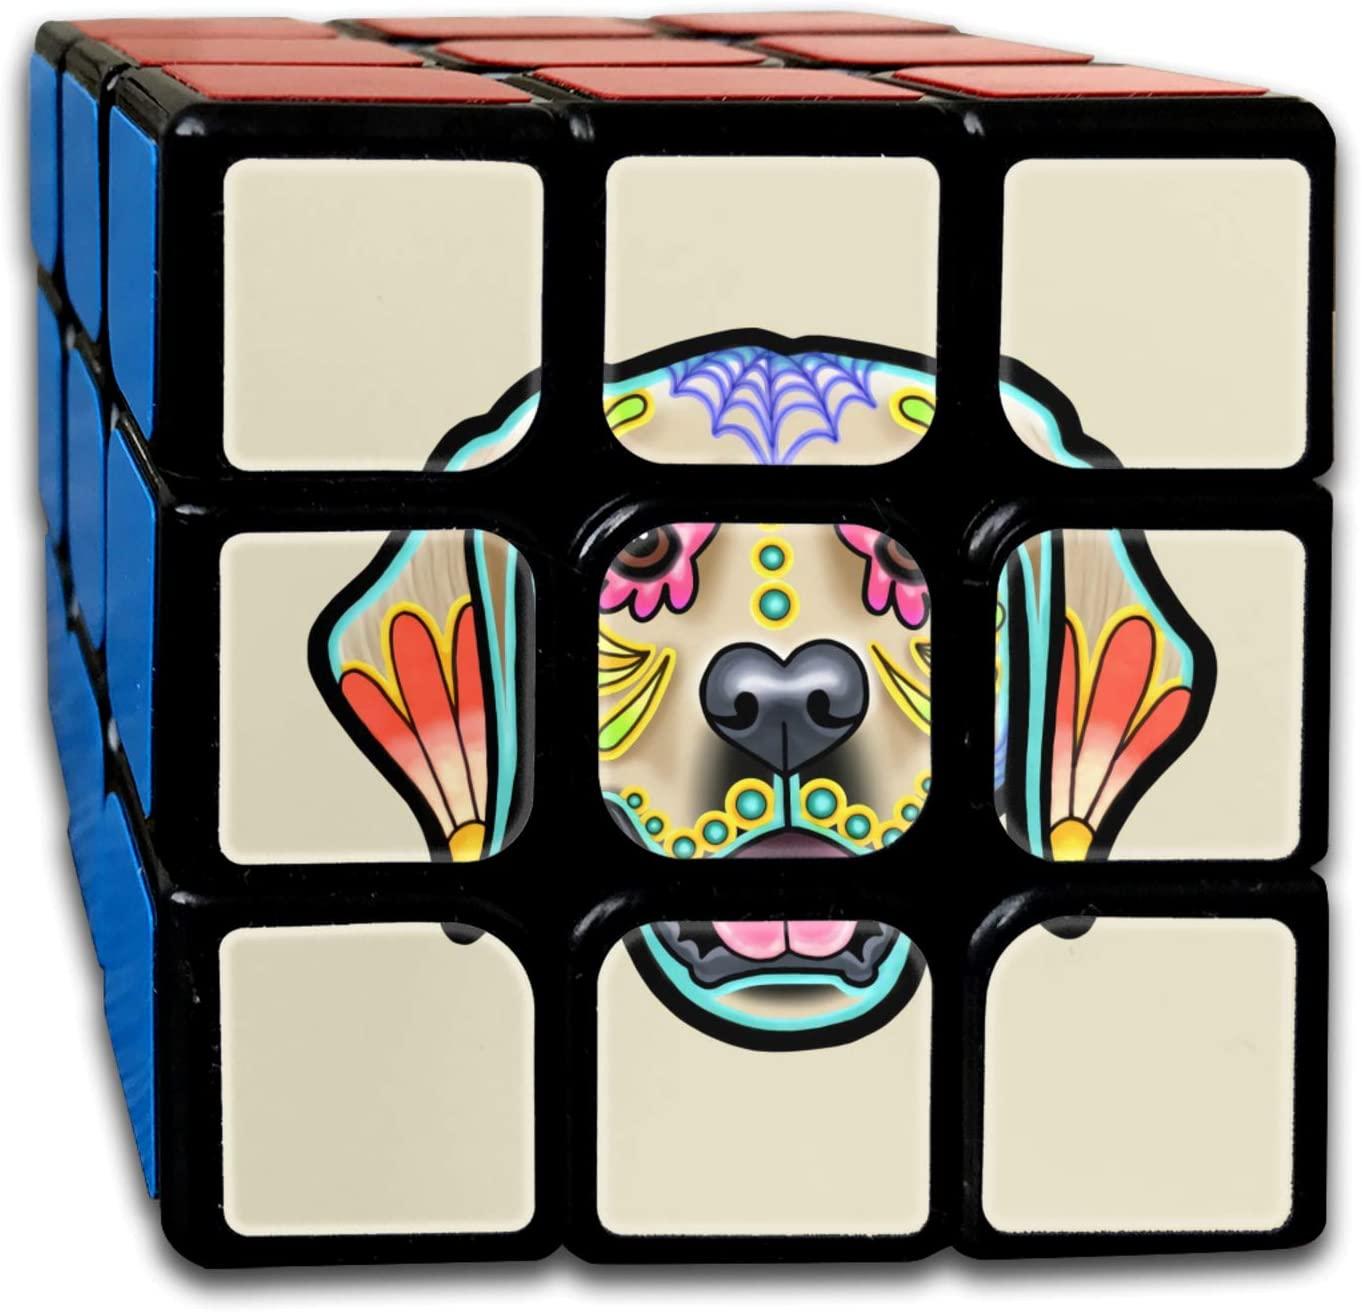 Golden Retriever - Day of The Dead Sugar Skull Dog Rubiks Cube One Size